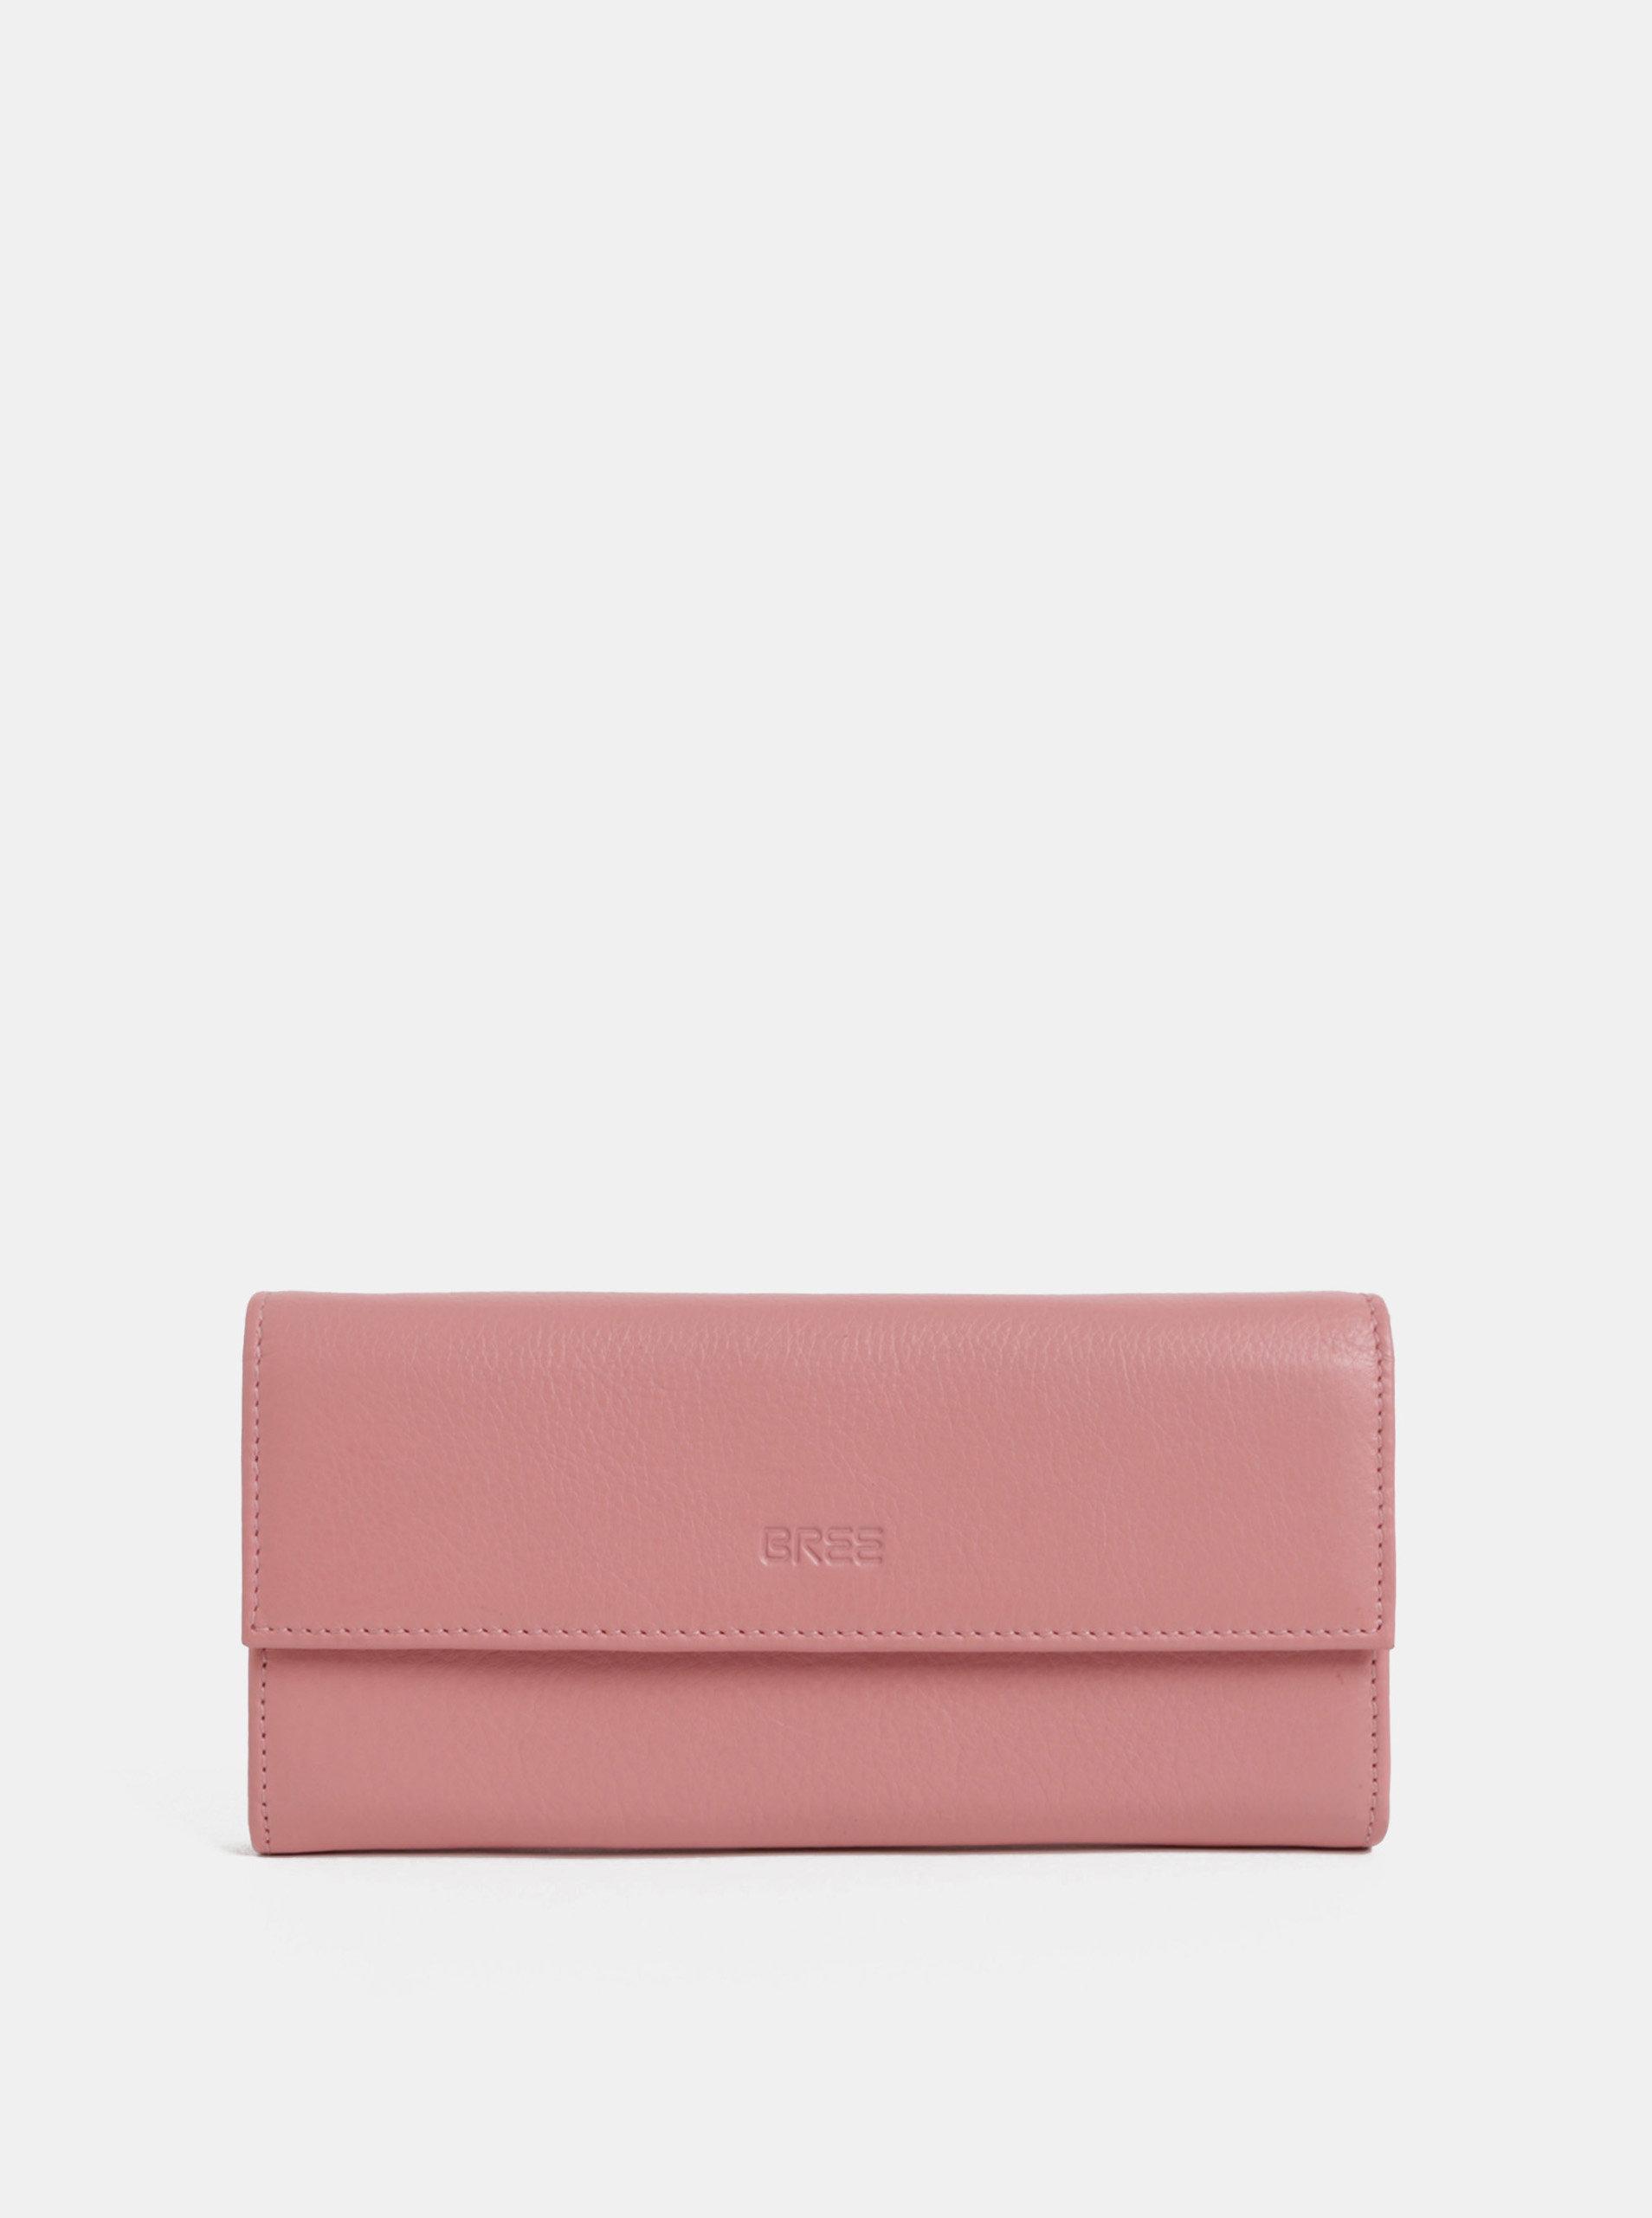 Růžová kožená peněženka BREE Issy 110